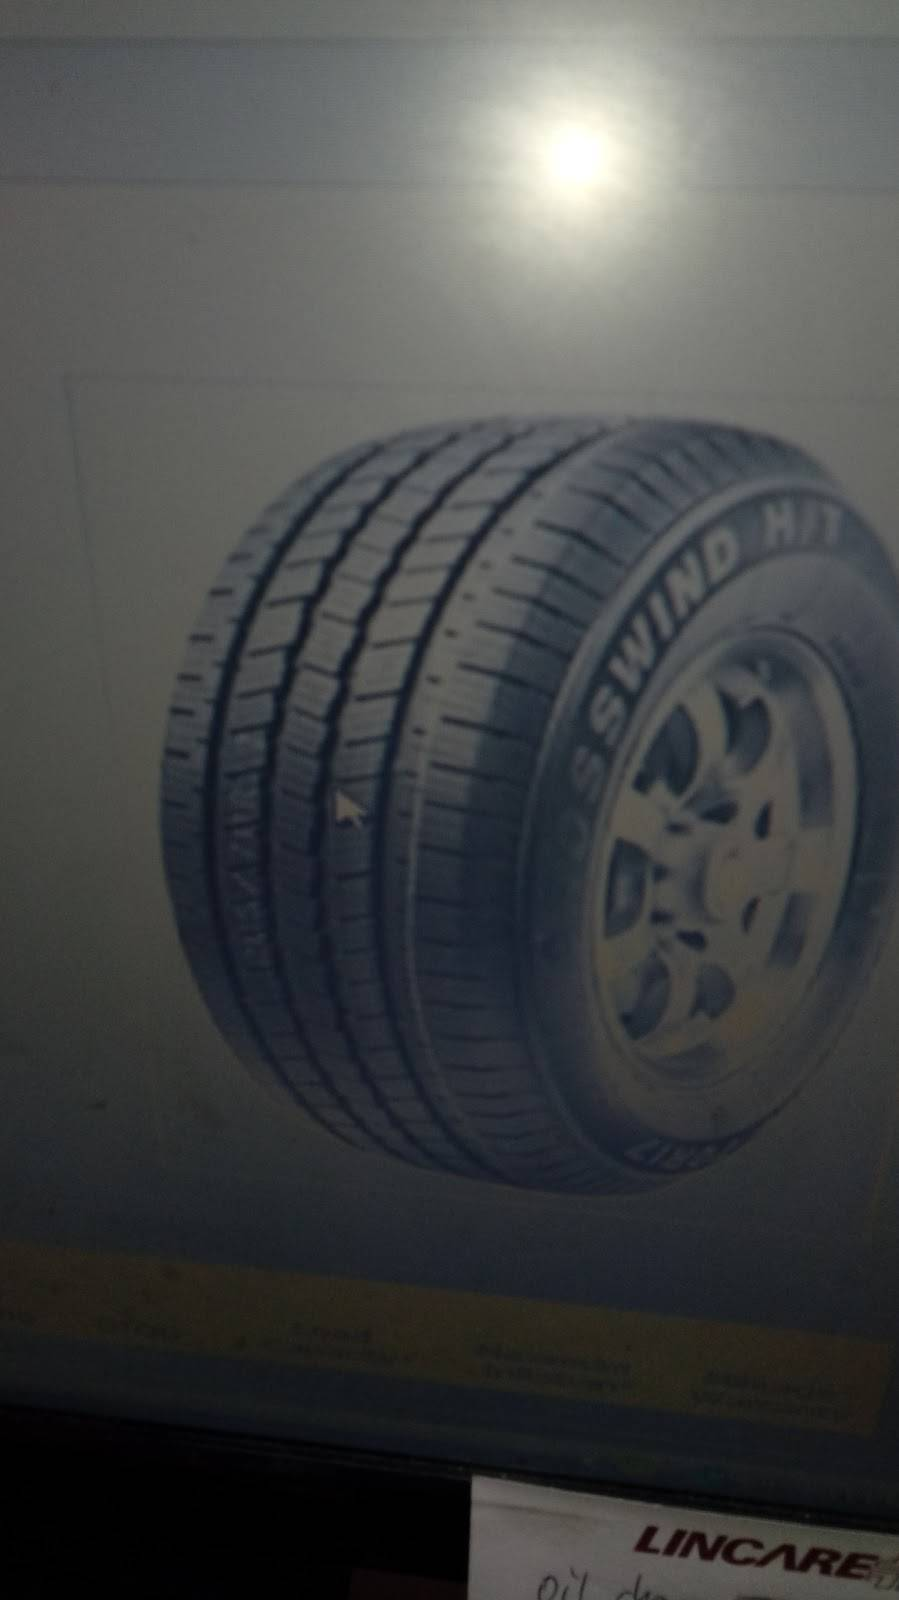 B & R Tire Services - car repair  | Photo 4 of 10 | Address: 4120 N Glenn Ave, Winston-Salem, NC 27105, USA | Phone: (336) 767-2910